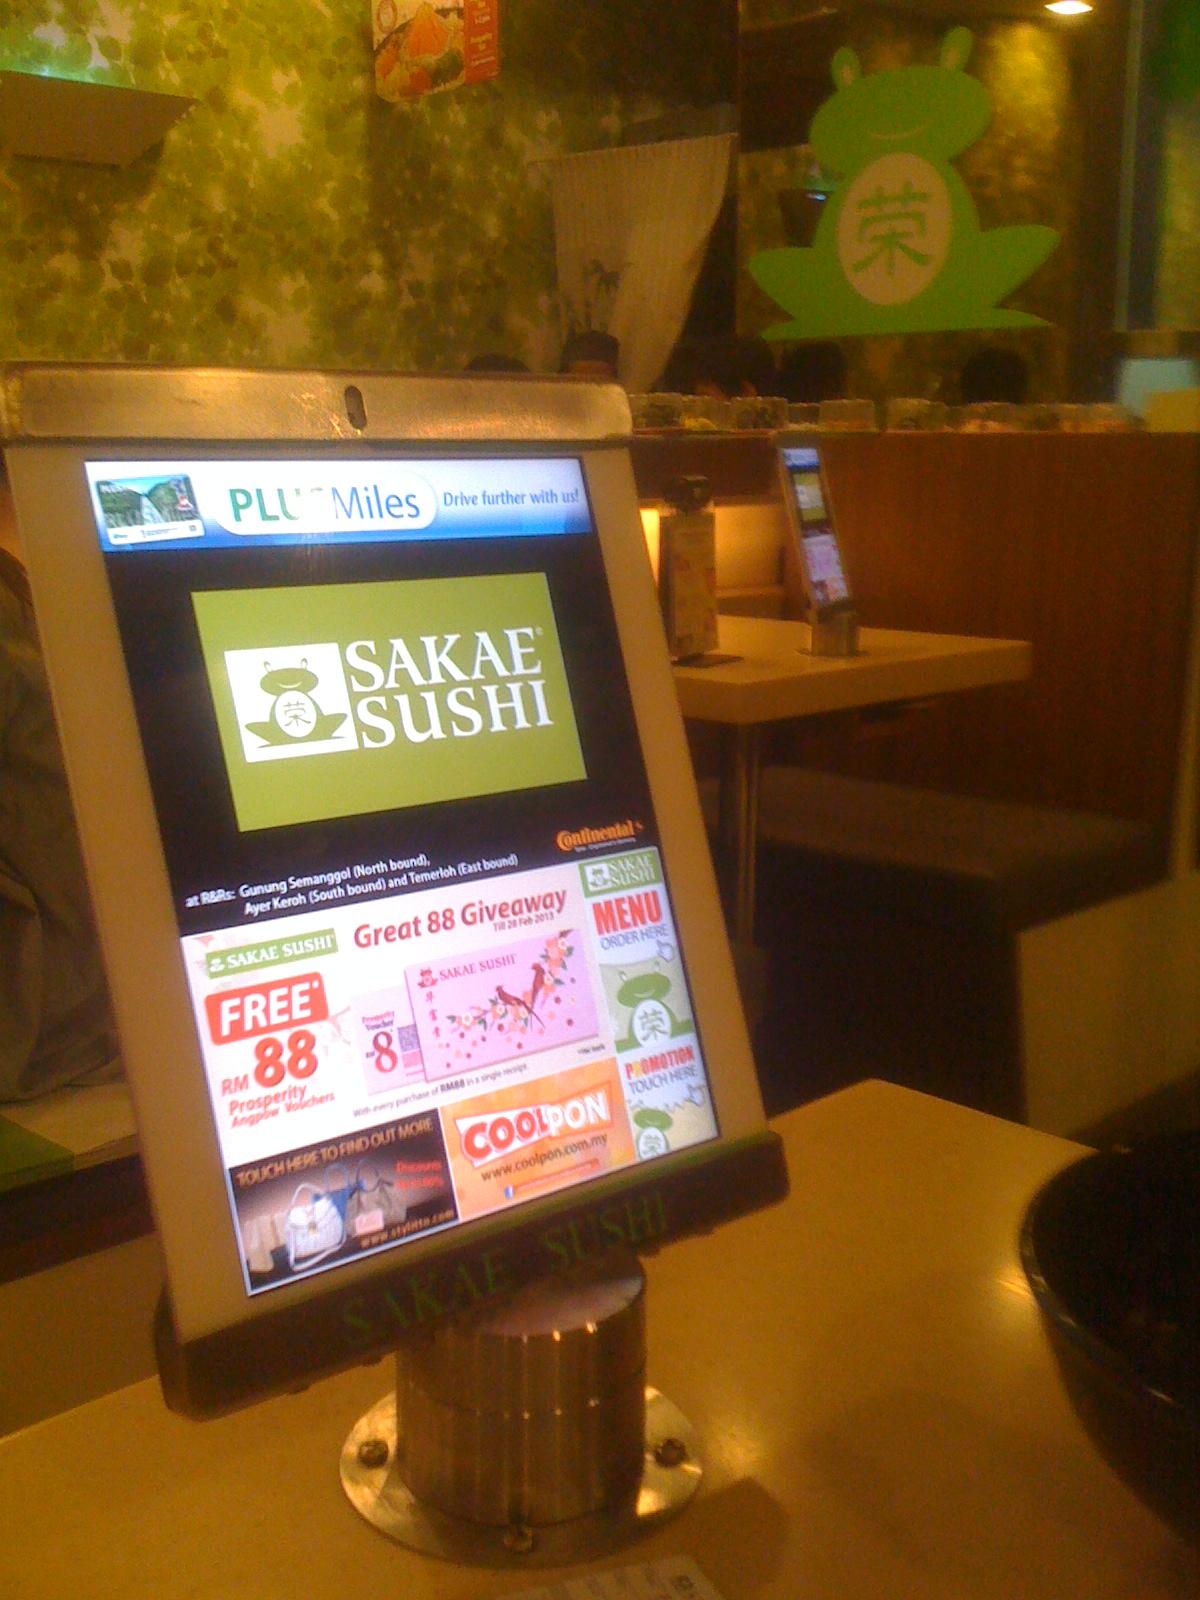 Mission Accomplished : Sakae Sushi --- We Serve Only What We Eat